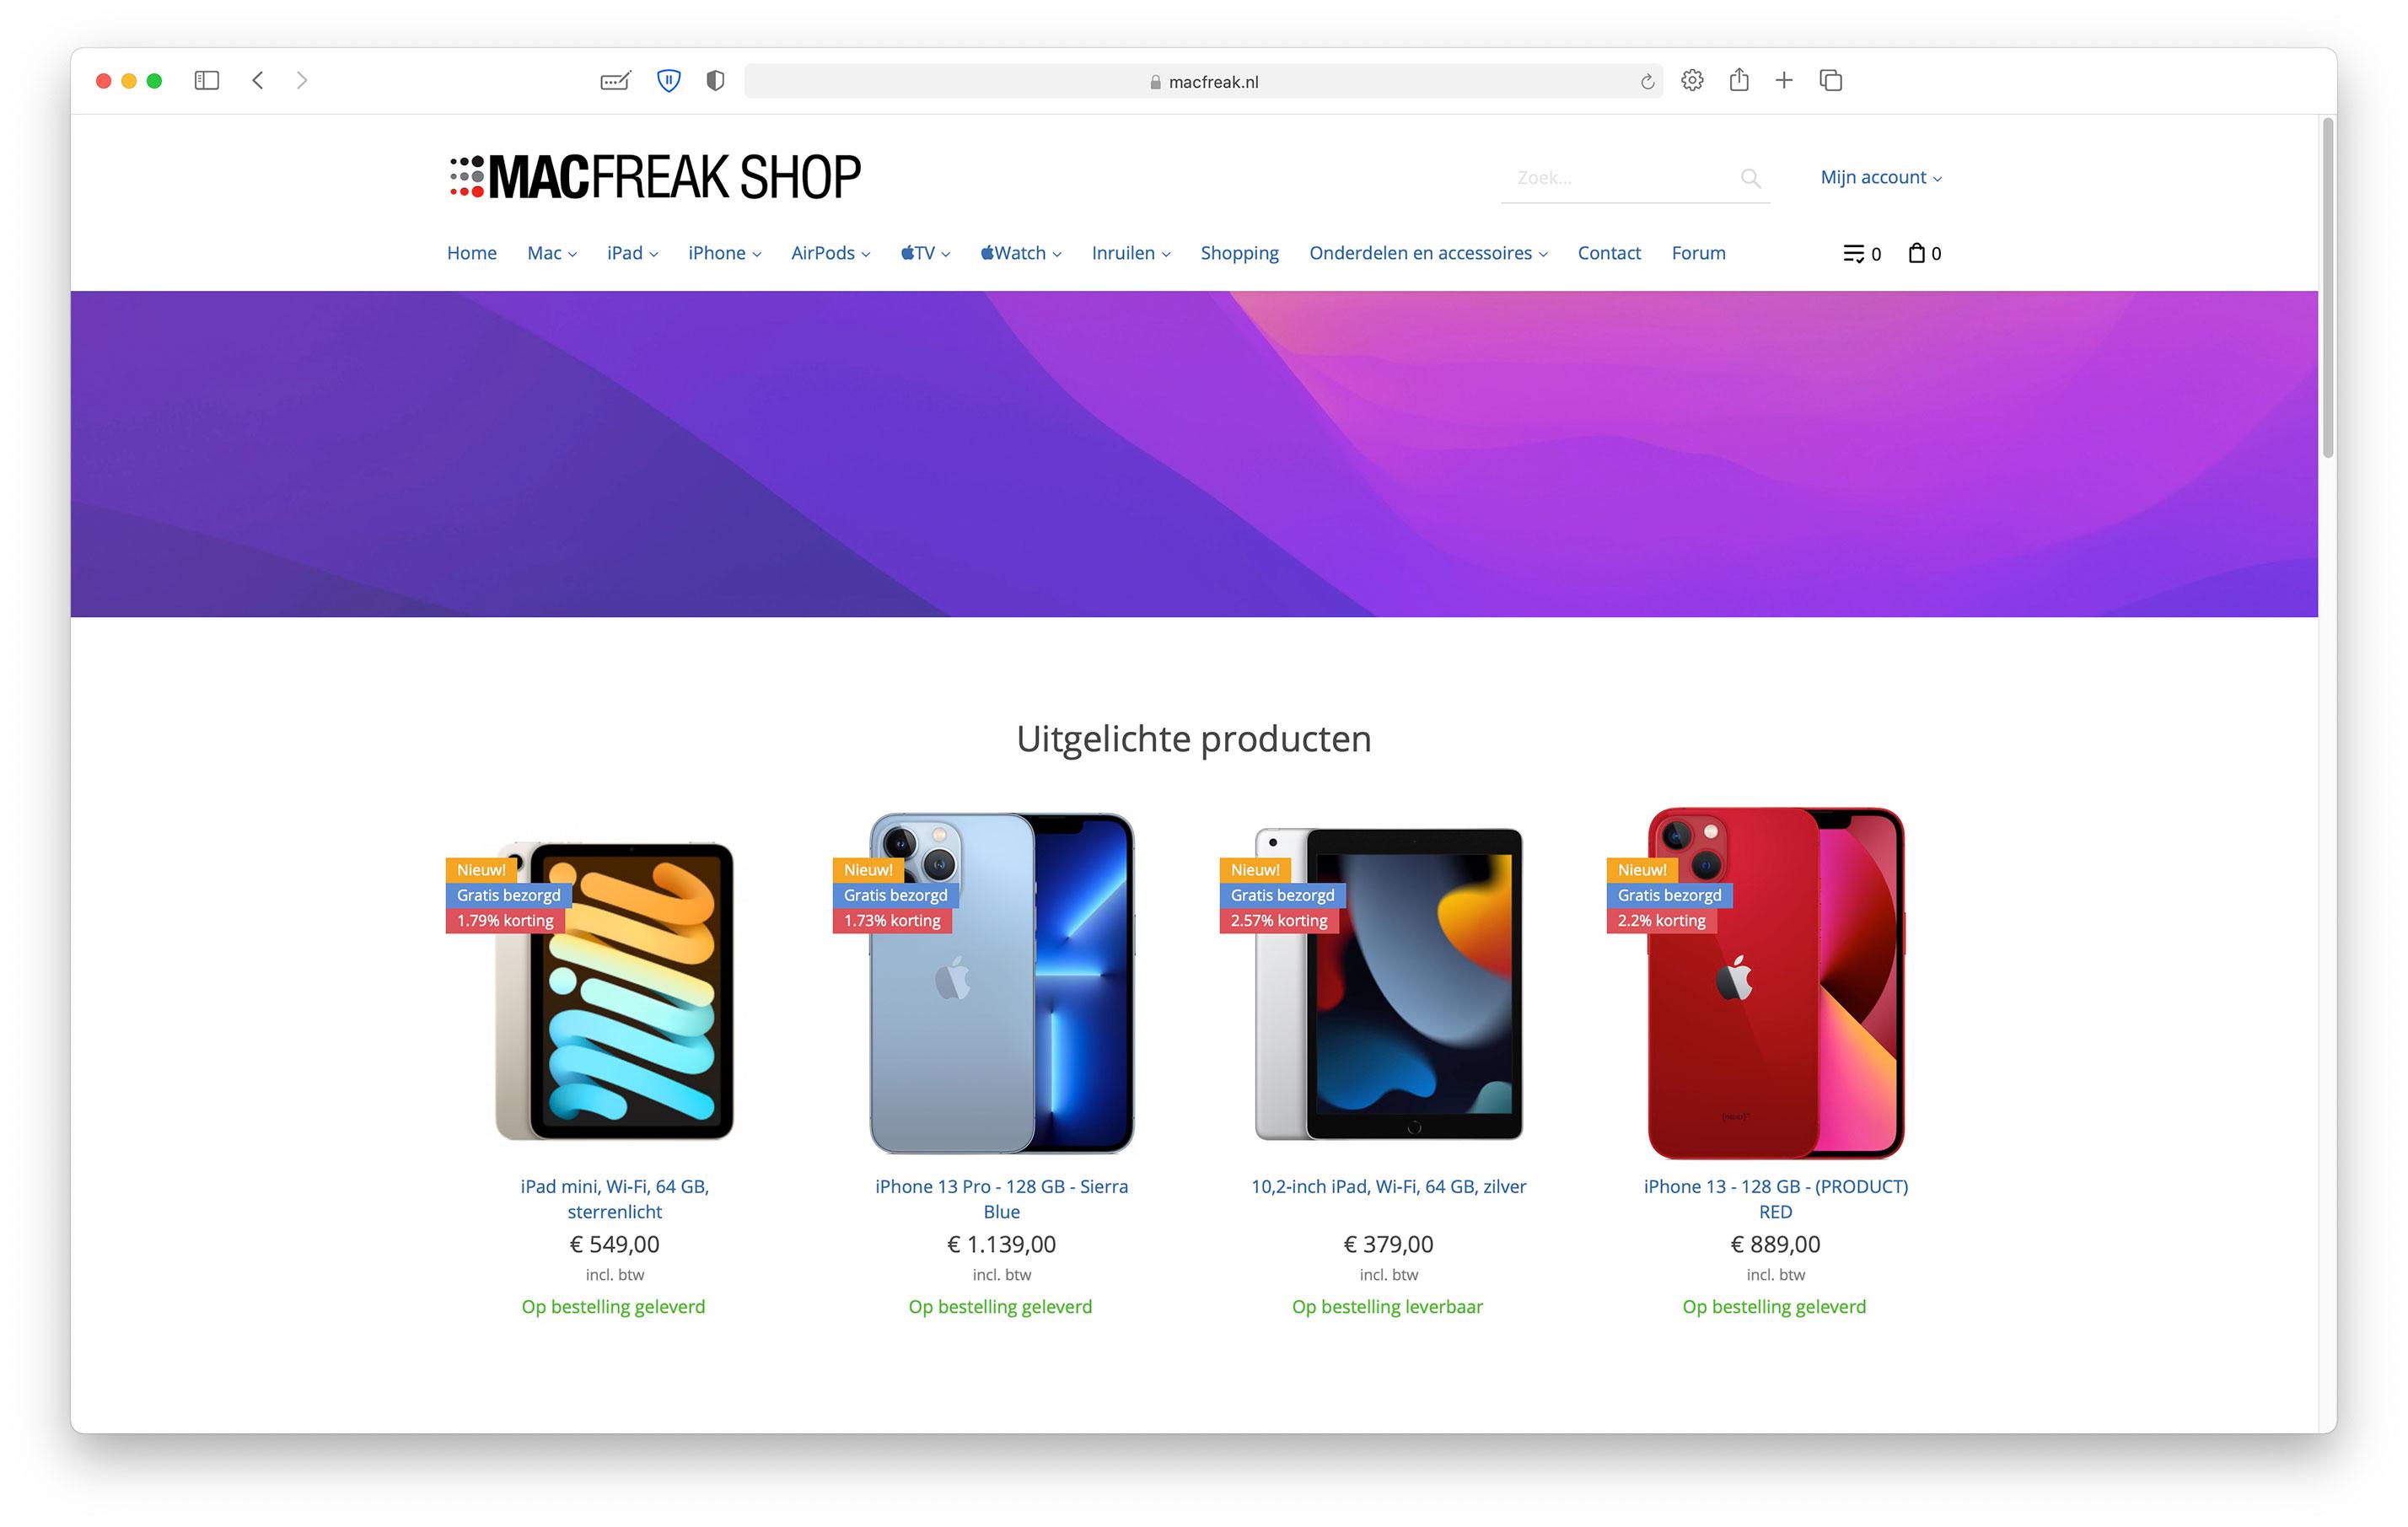 https://www.macfreak.nl/modules/news/images/zArt.iPhone13iPads2021MacFreakShop.jpg